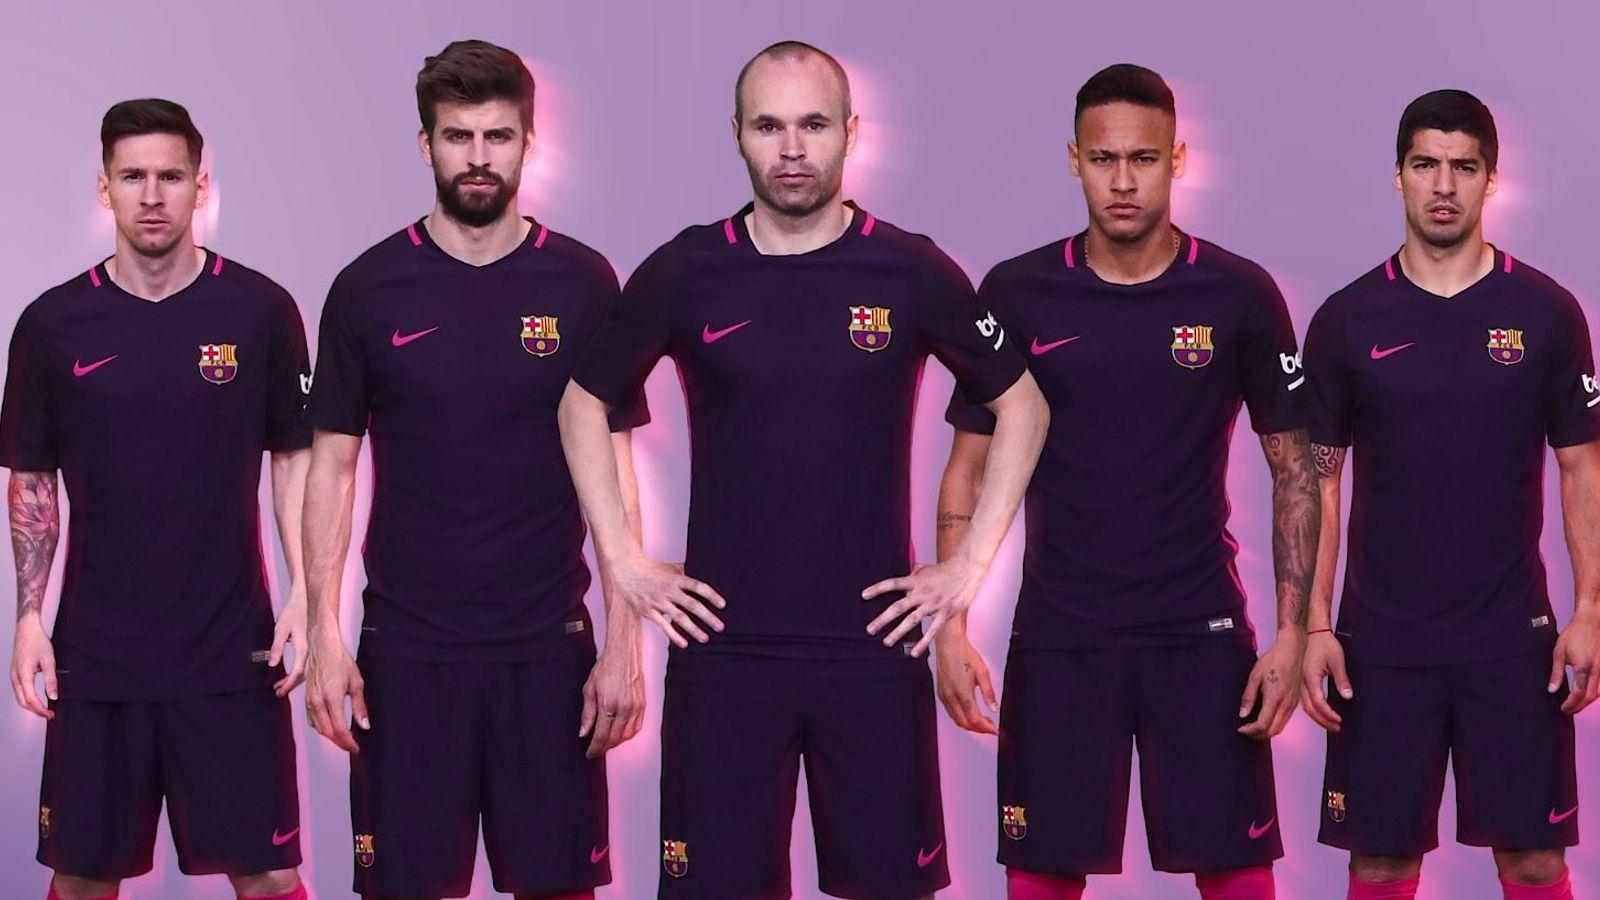 e68f50fb3 Barcelona unveil purple away kit for 2016 17 season